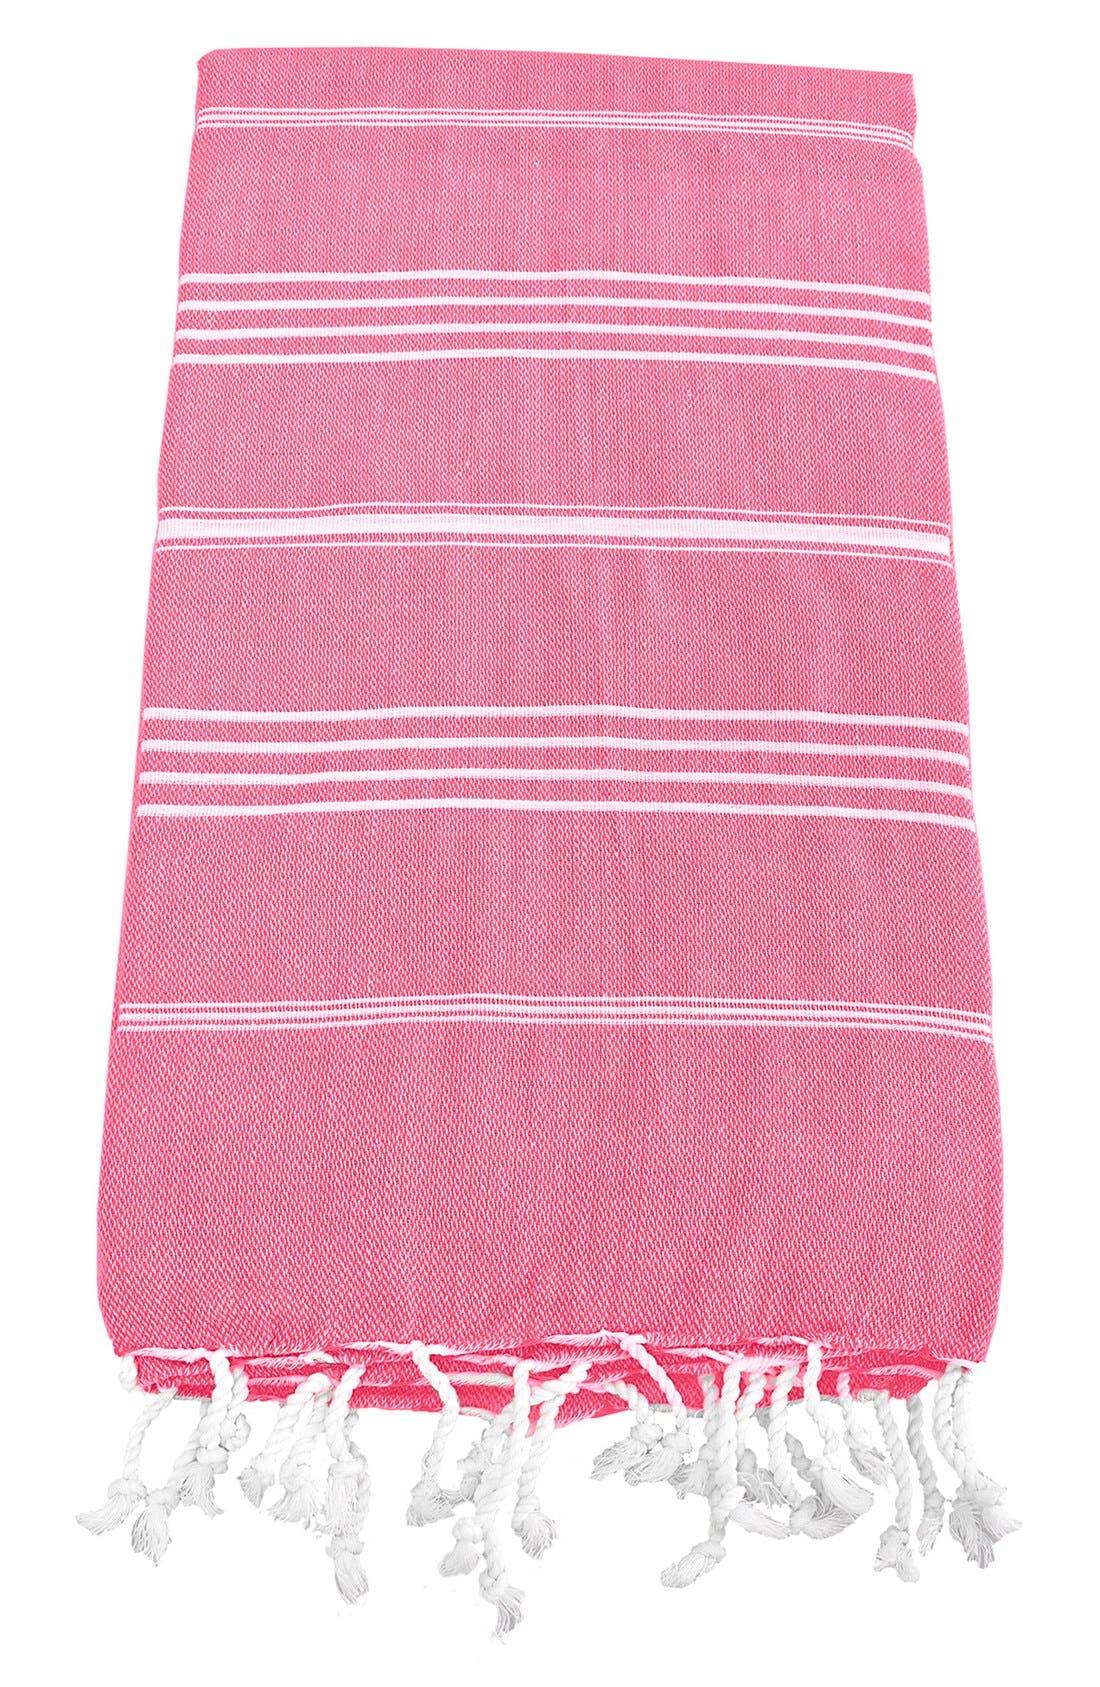 Monogram Turkish Cotton Towel,                             Main thumbnail 136, color,